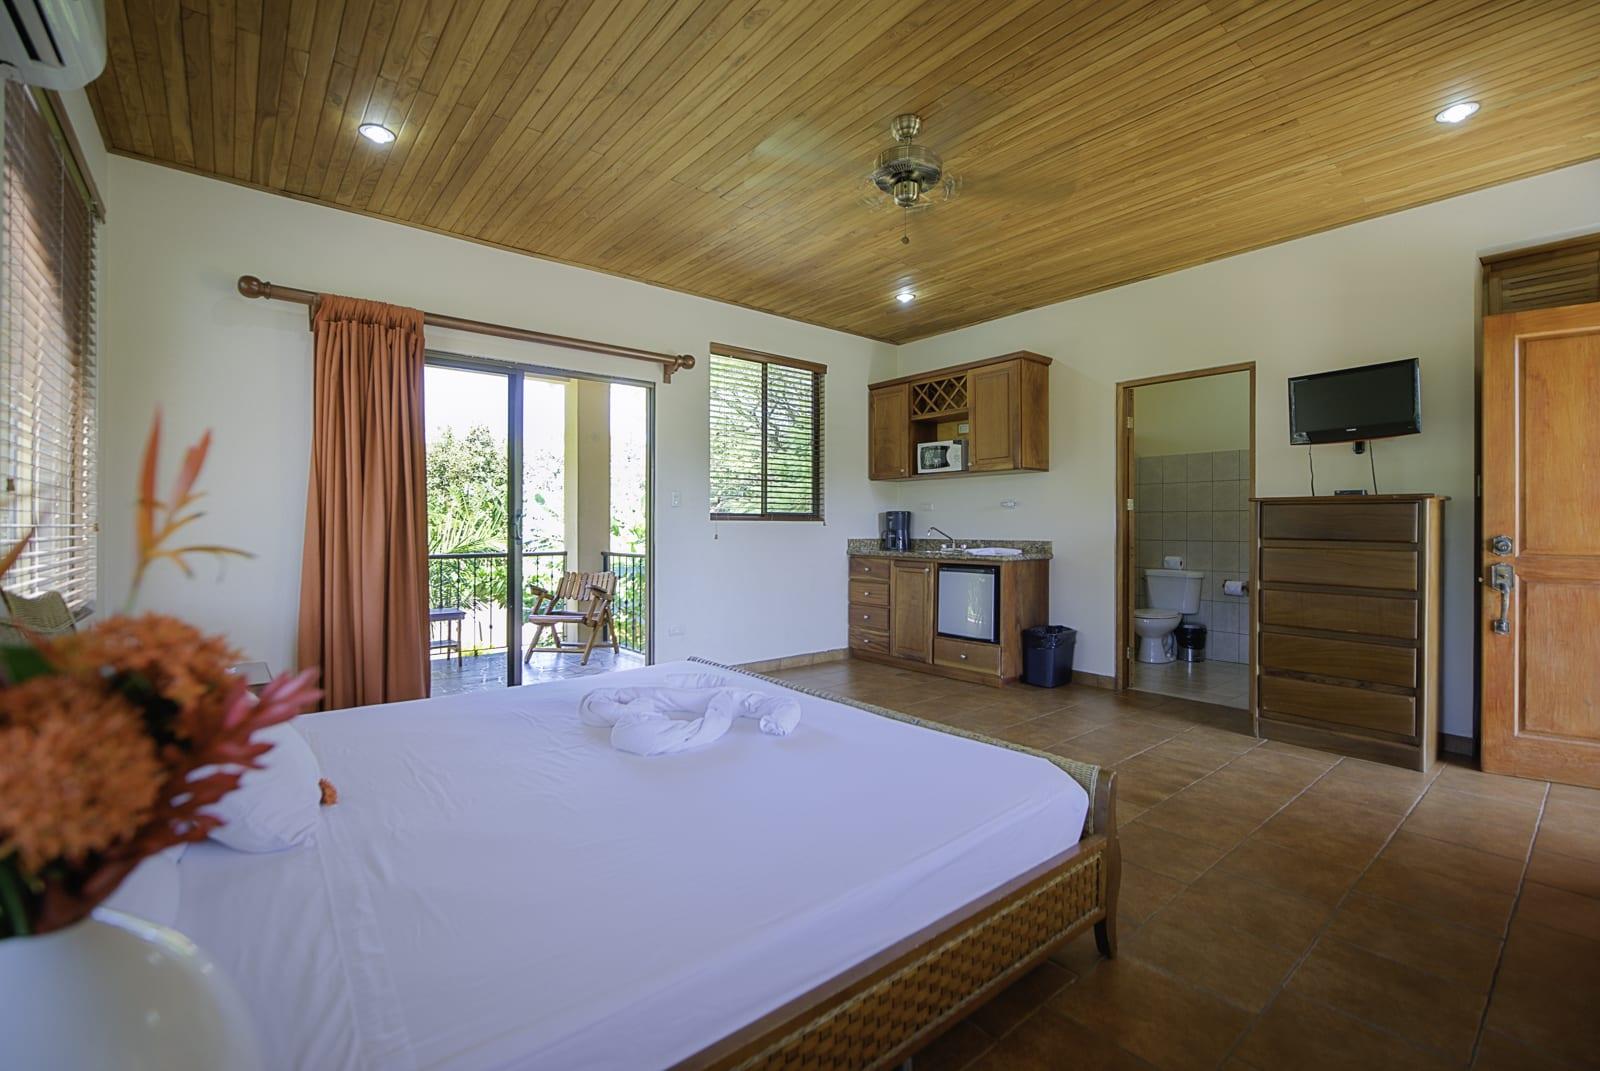 6 Spacious suite rooms